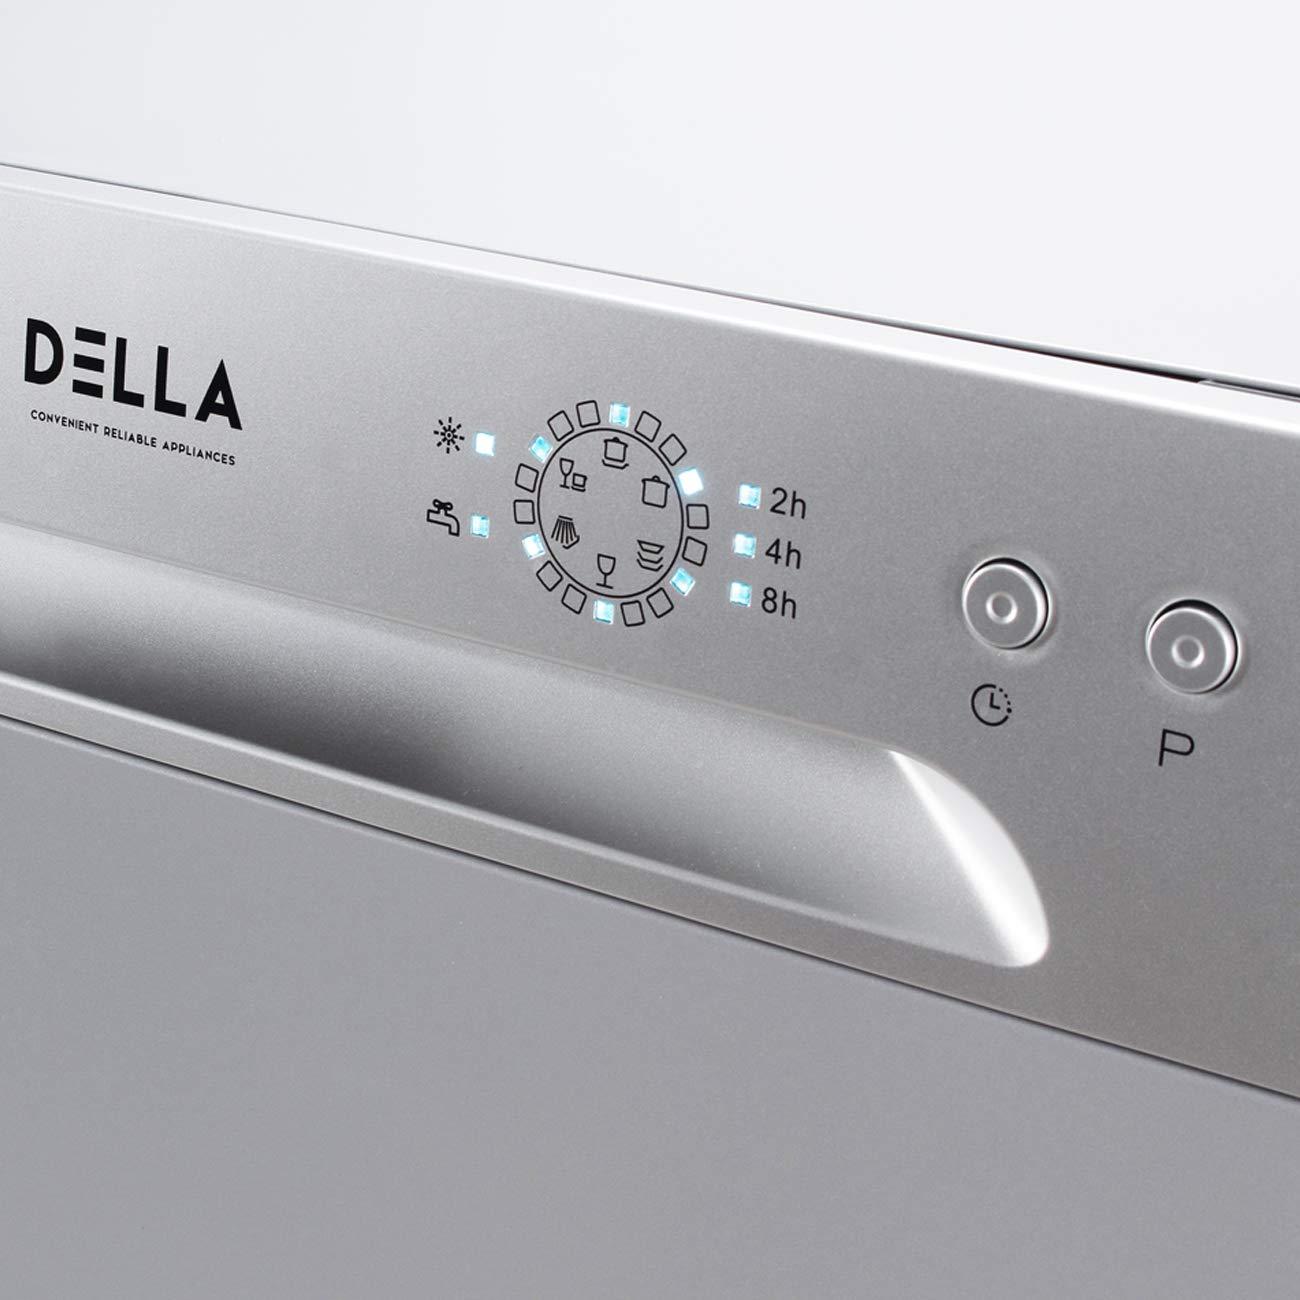 DELLA Portable Compact Countertop Dishwasher 6 Wash Cycles Dishwashers Setting Racks Silverware Basket Black